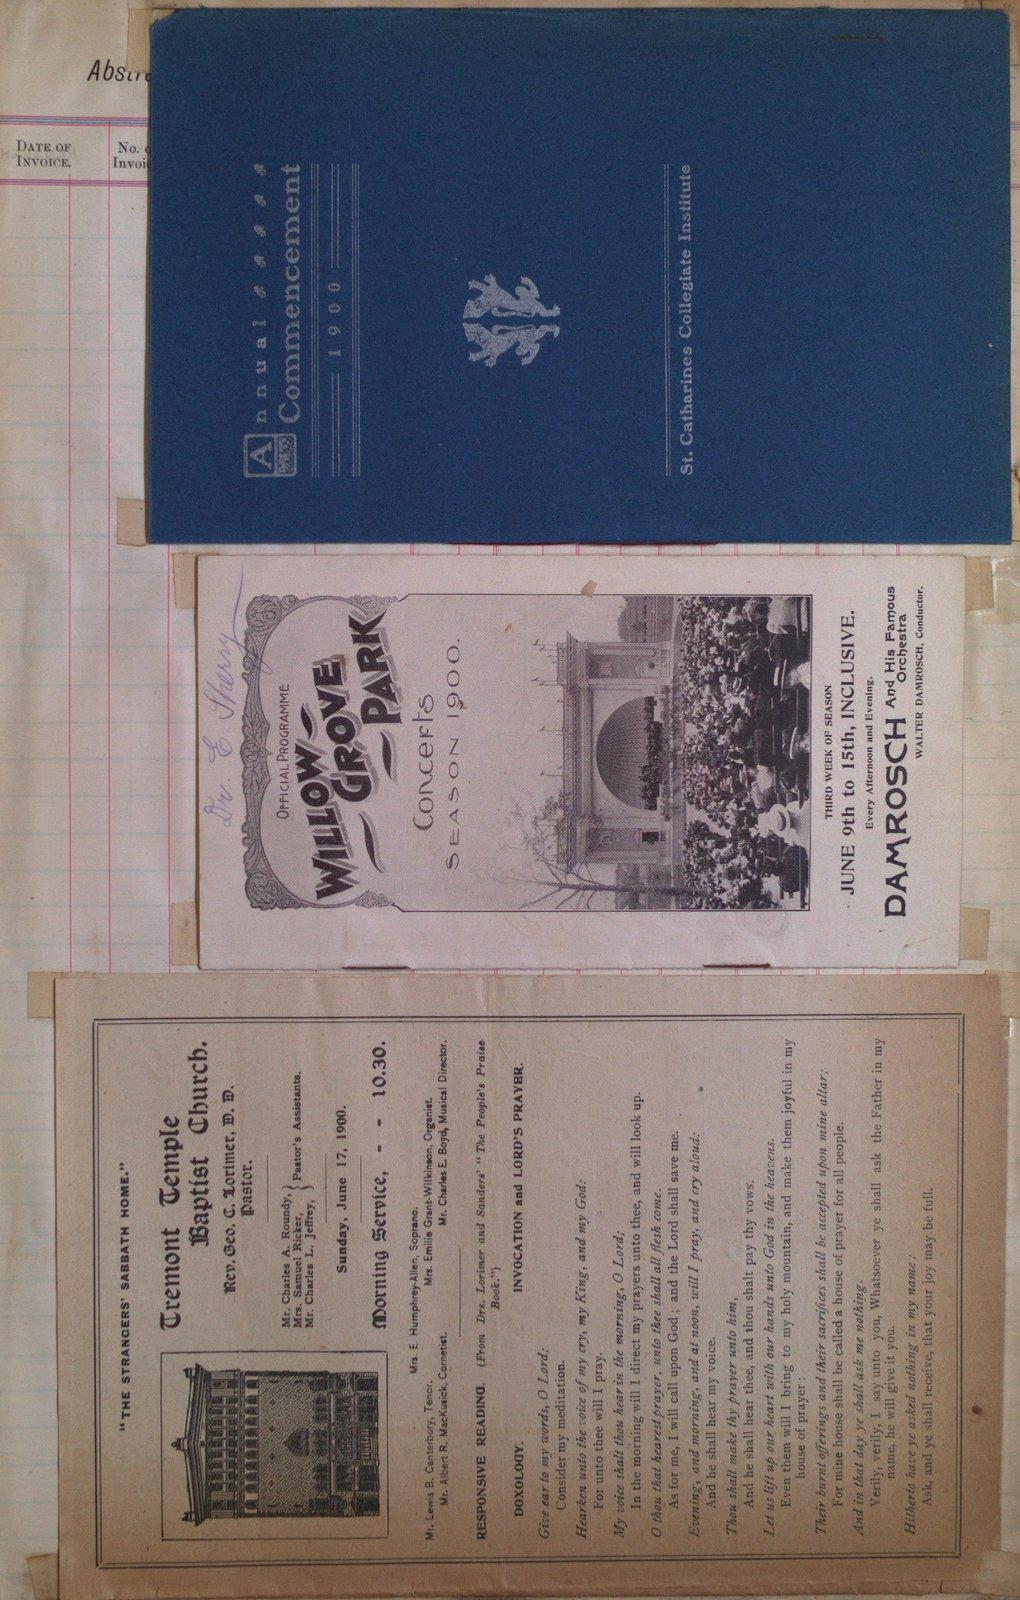 Teresa Vanderburgh's Musical Scrapbook #2 - Concert Program, Church Service Program & Commencement Program